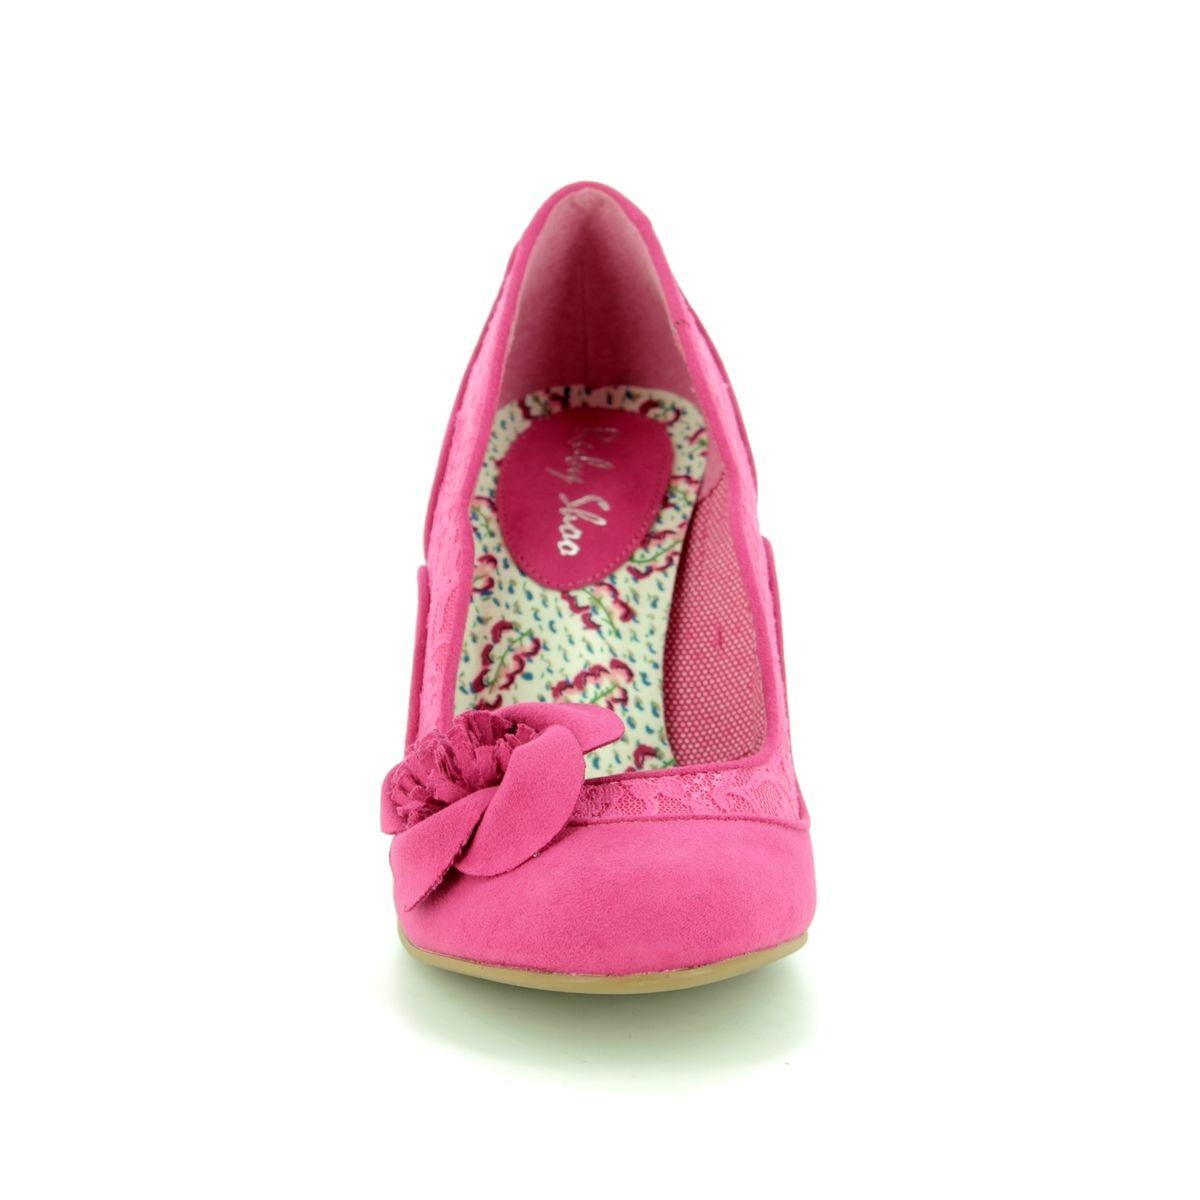 0ef653f549b7 Ruby Shoo High-heeled Shoes - Fuchsia - 09297 62 VERONICA